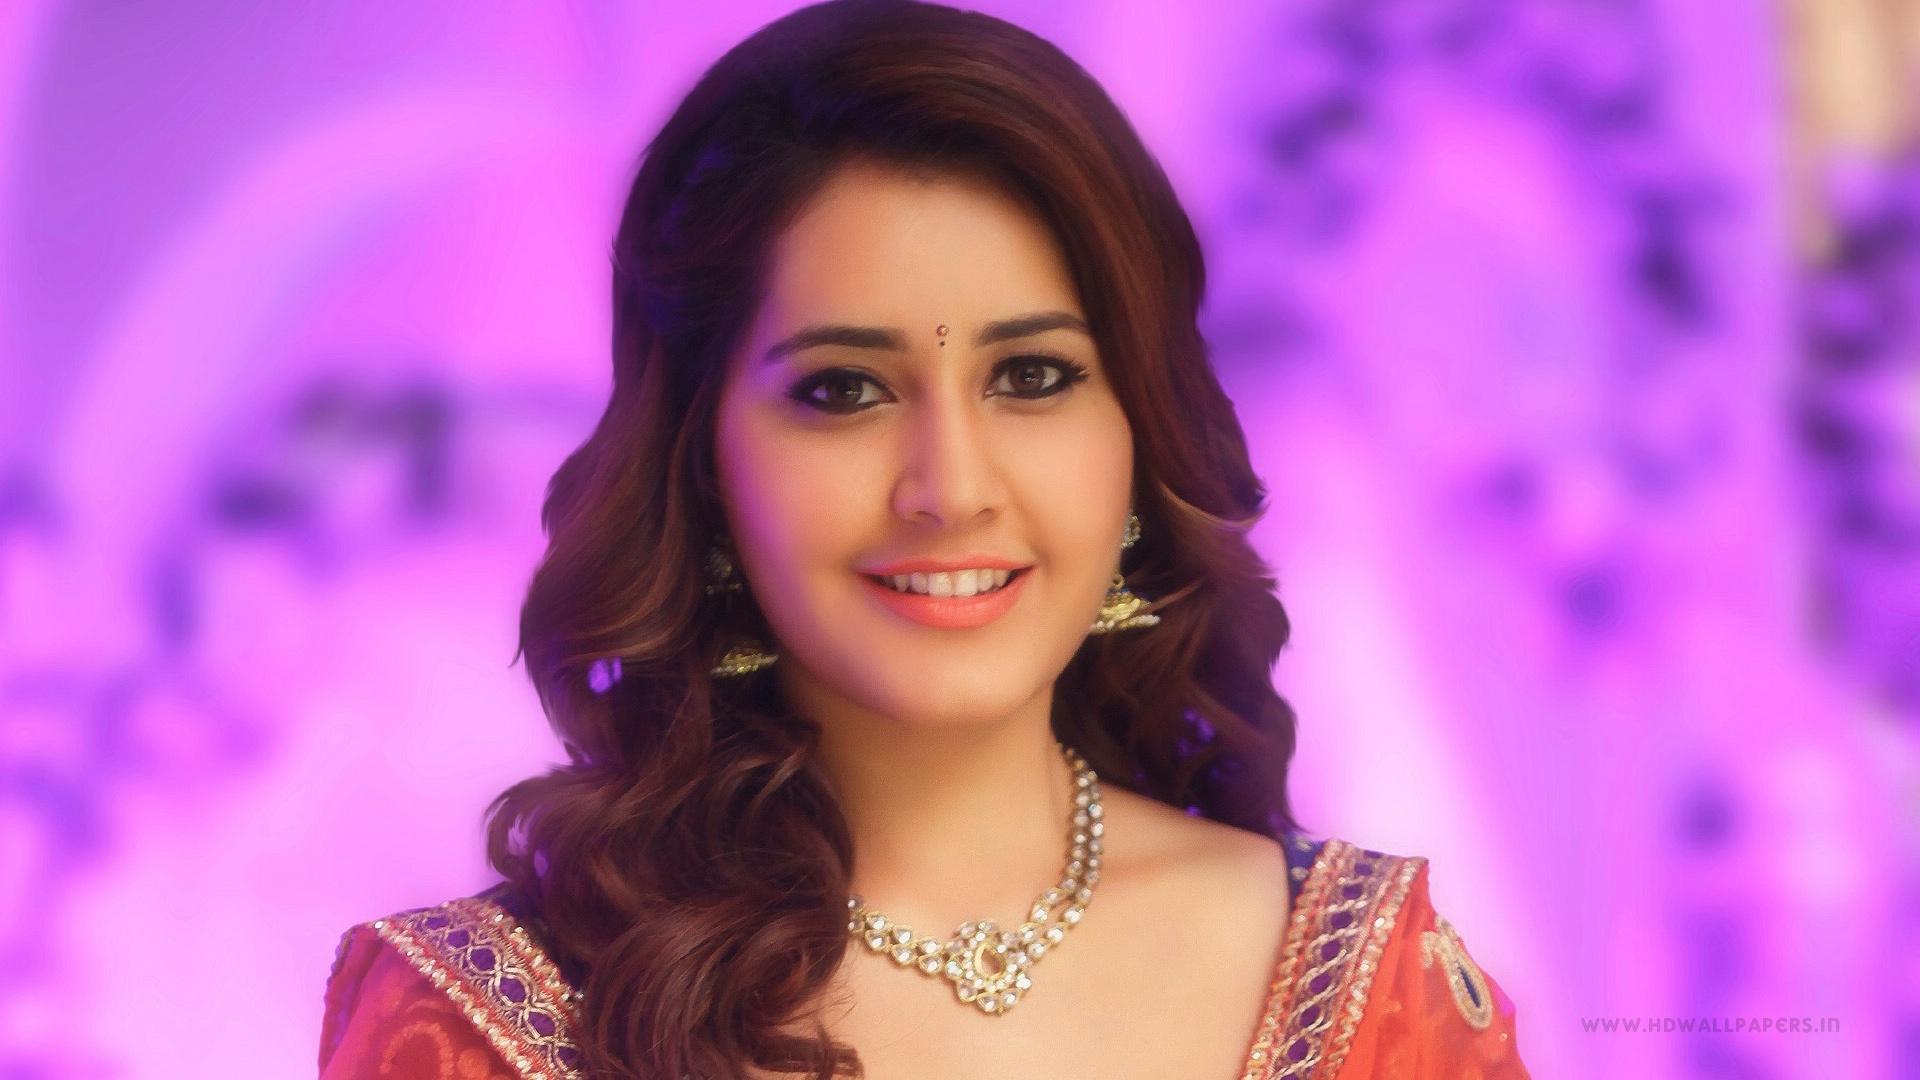 Rashi Khanna Indian Actress All Heroines Photos Download 1920x1080 Wallpaper Teahub Io